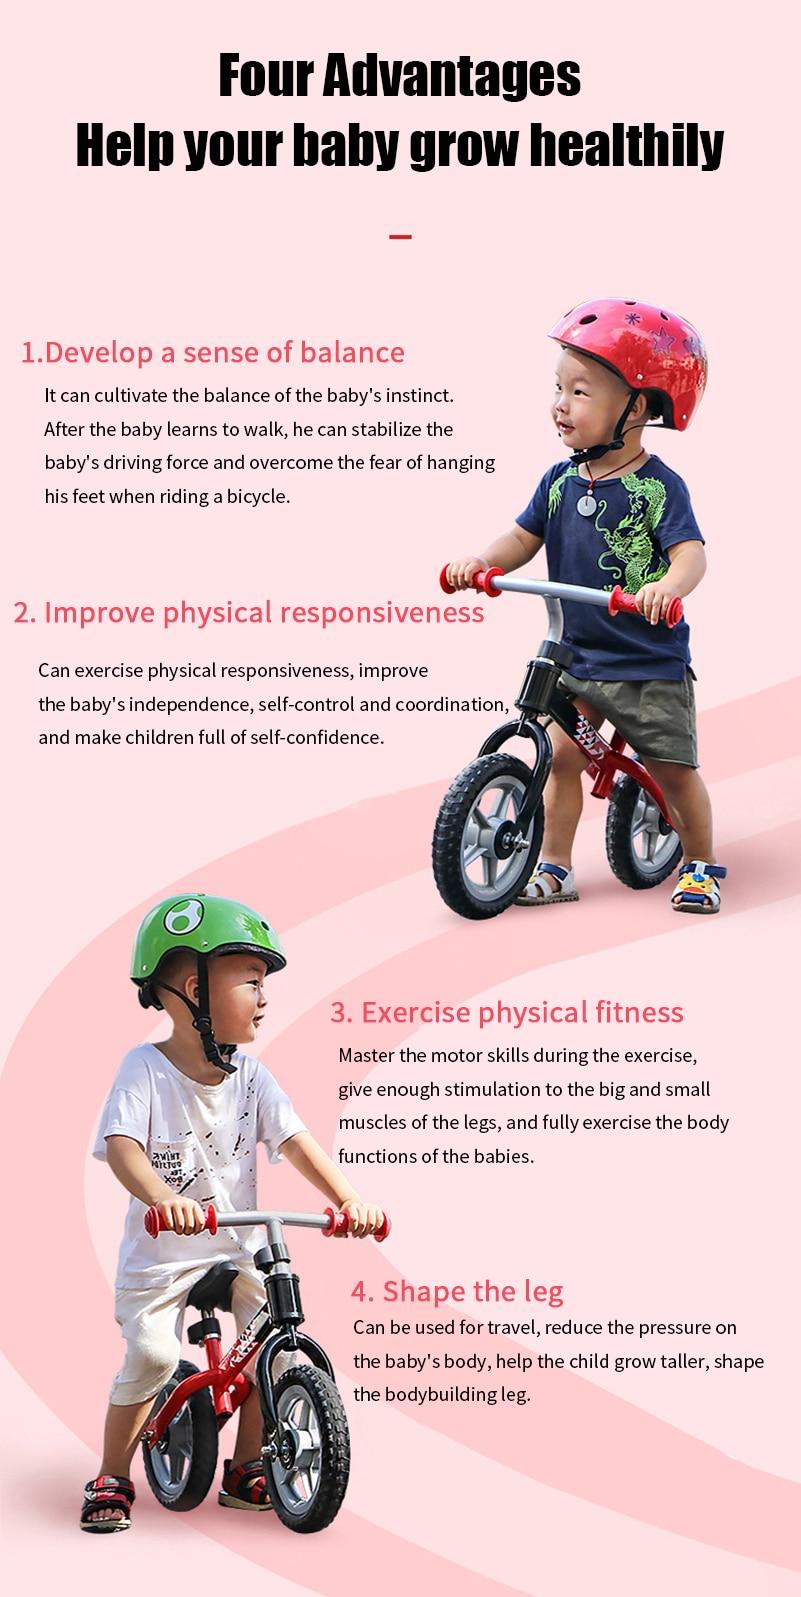 HTB1TWXIacfrK1Rjy1Xdq6yemFXah WEST BIKING Children's Bike Pedal-less Balance Bicycle Balance For 2-4 Years Old Anti-skid Baby Walker Children Balance Bike